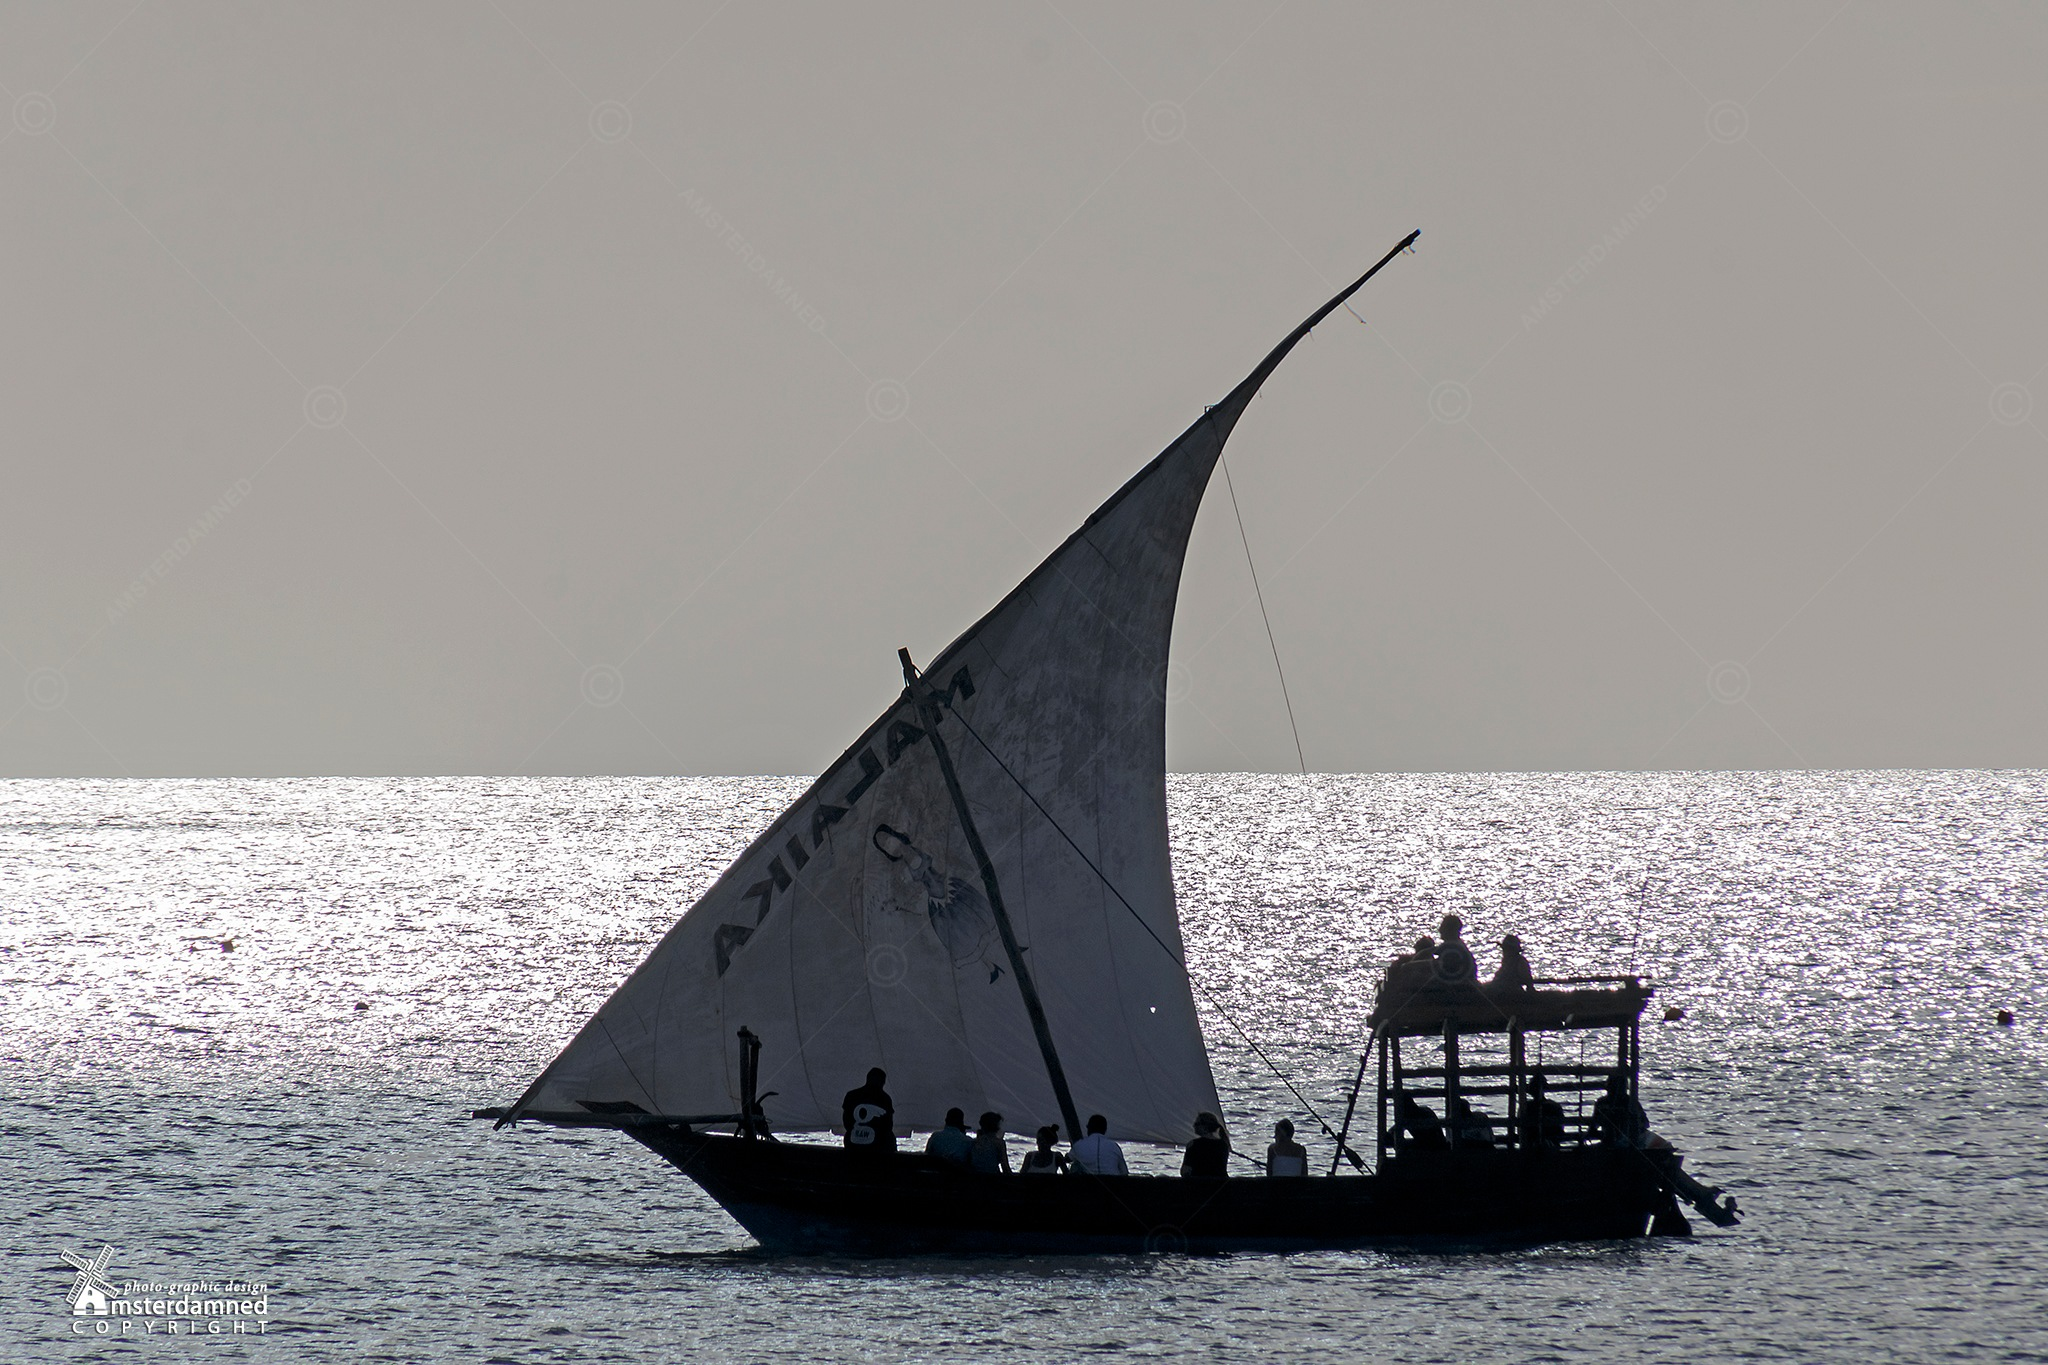 Nungwi (Zanzibar), Tanzania by Michael